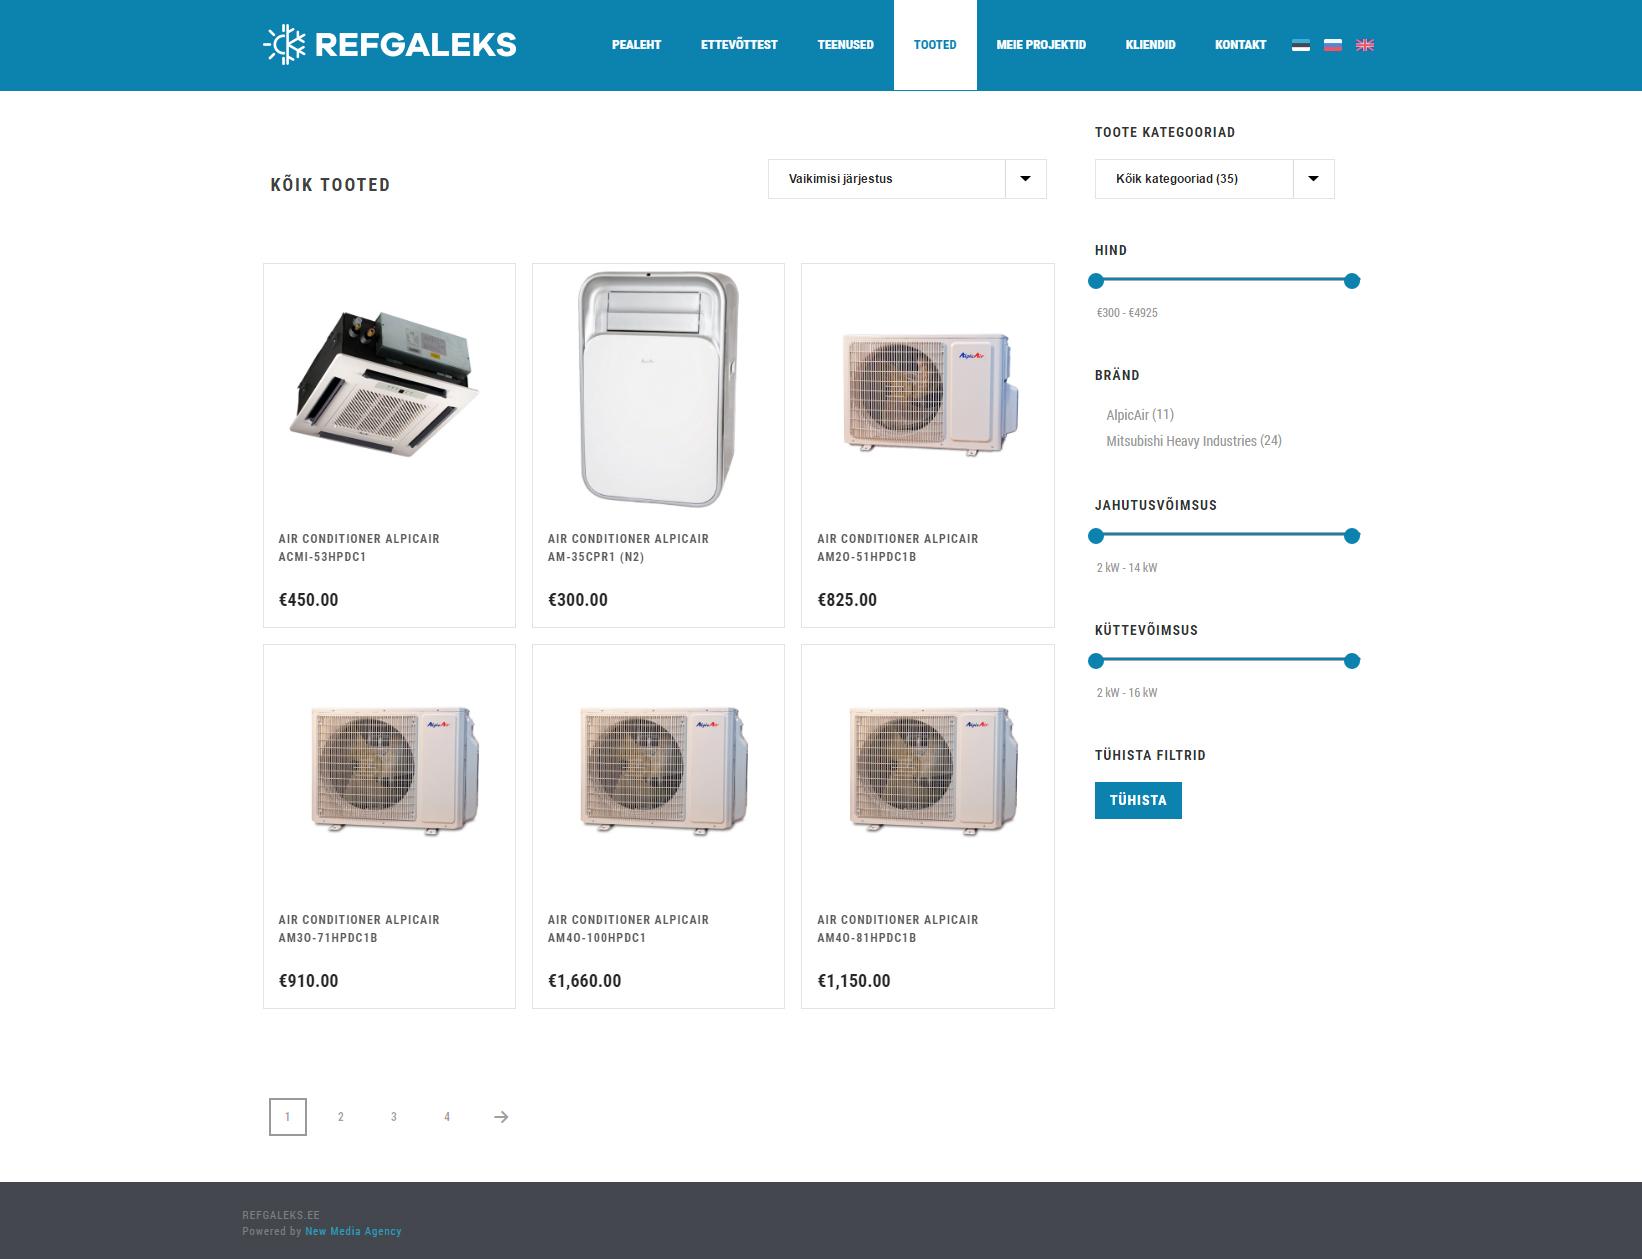 Refgaleks products